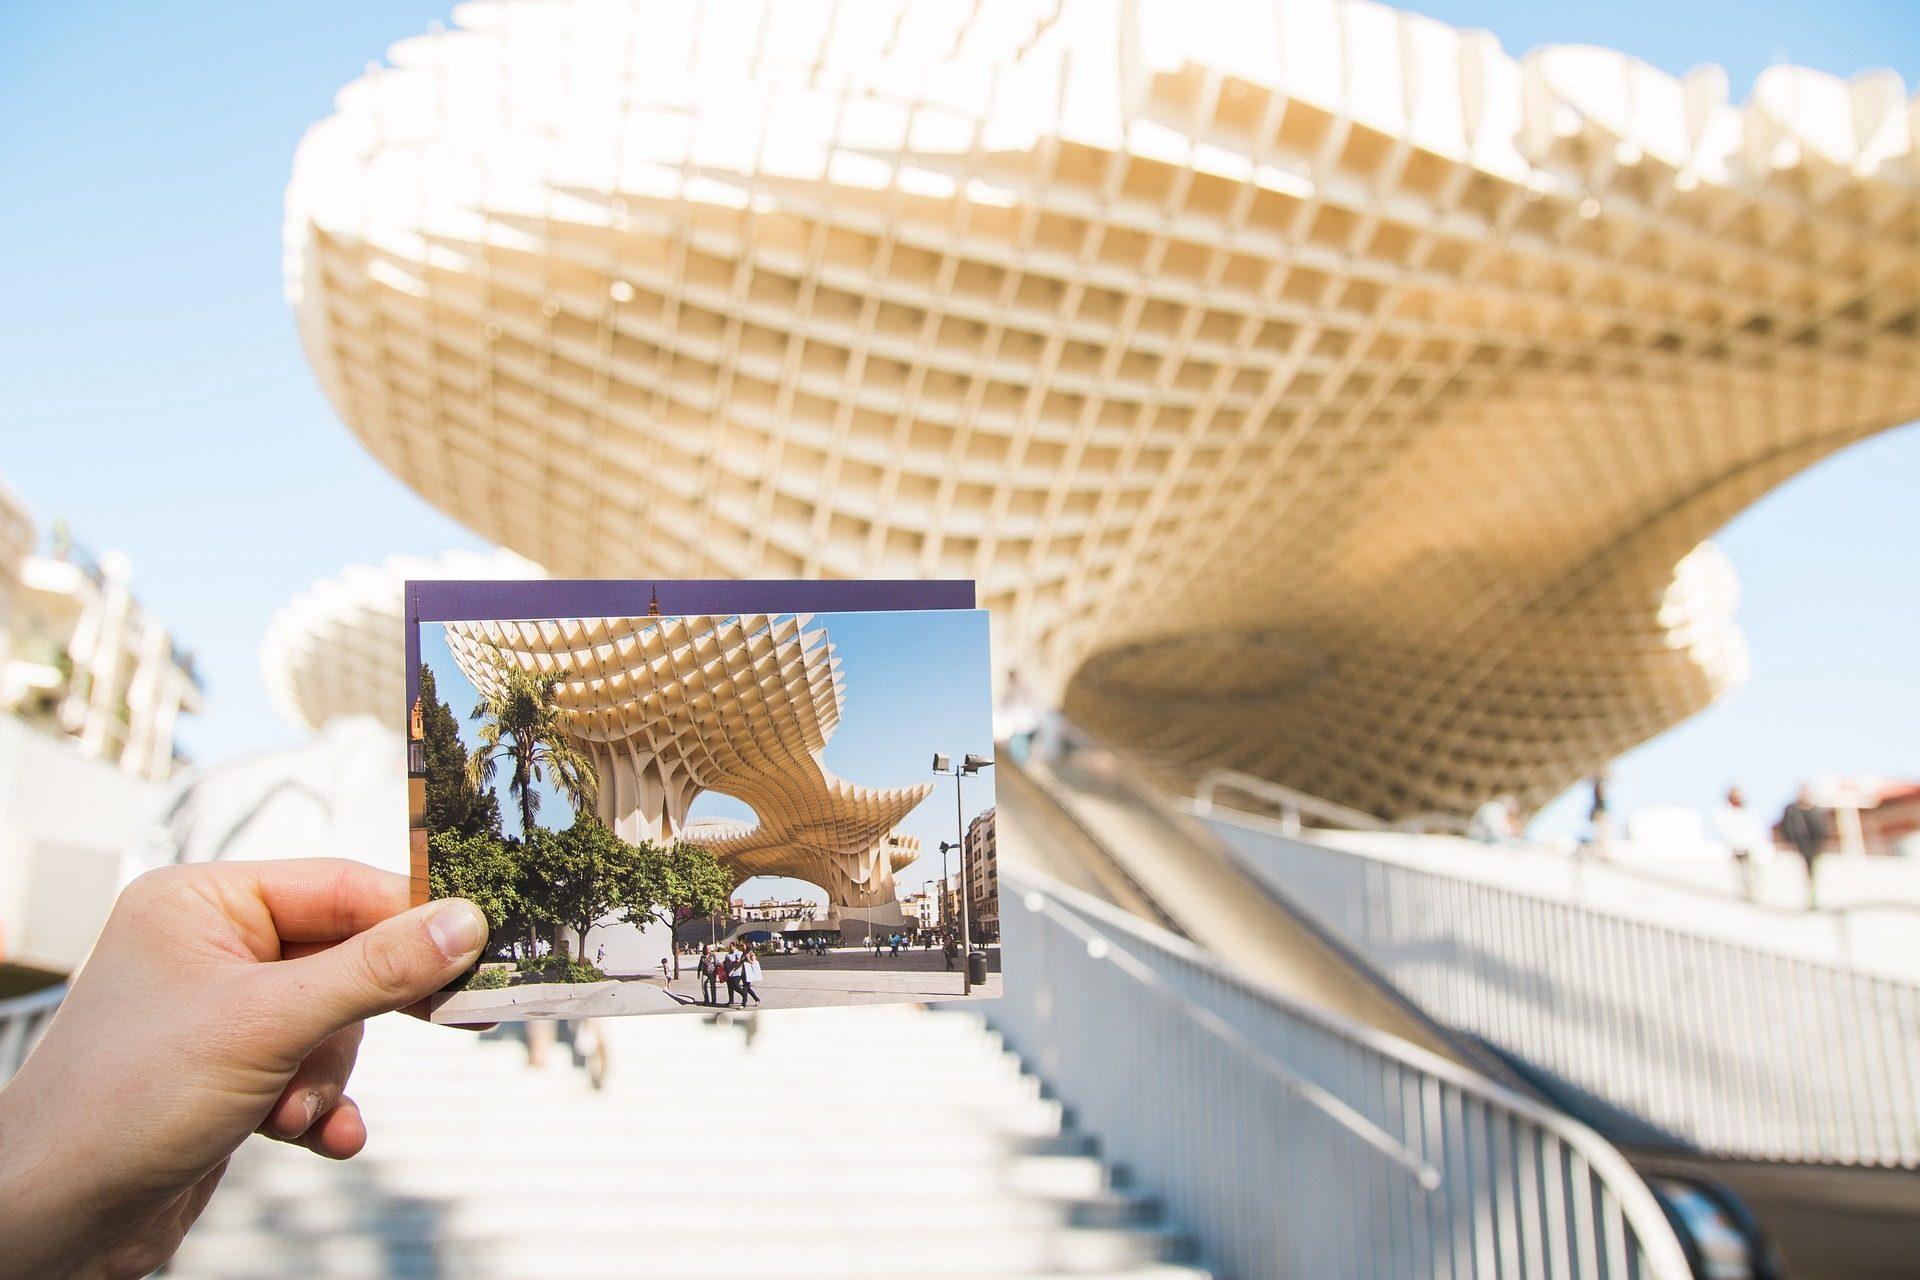 Fondo de pantalla de metropol parasol setas postales - Arquitectura sevilla ...